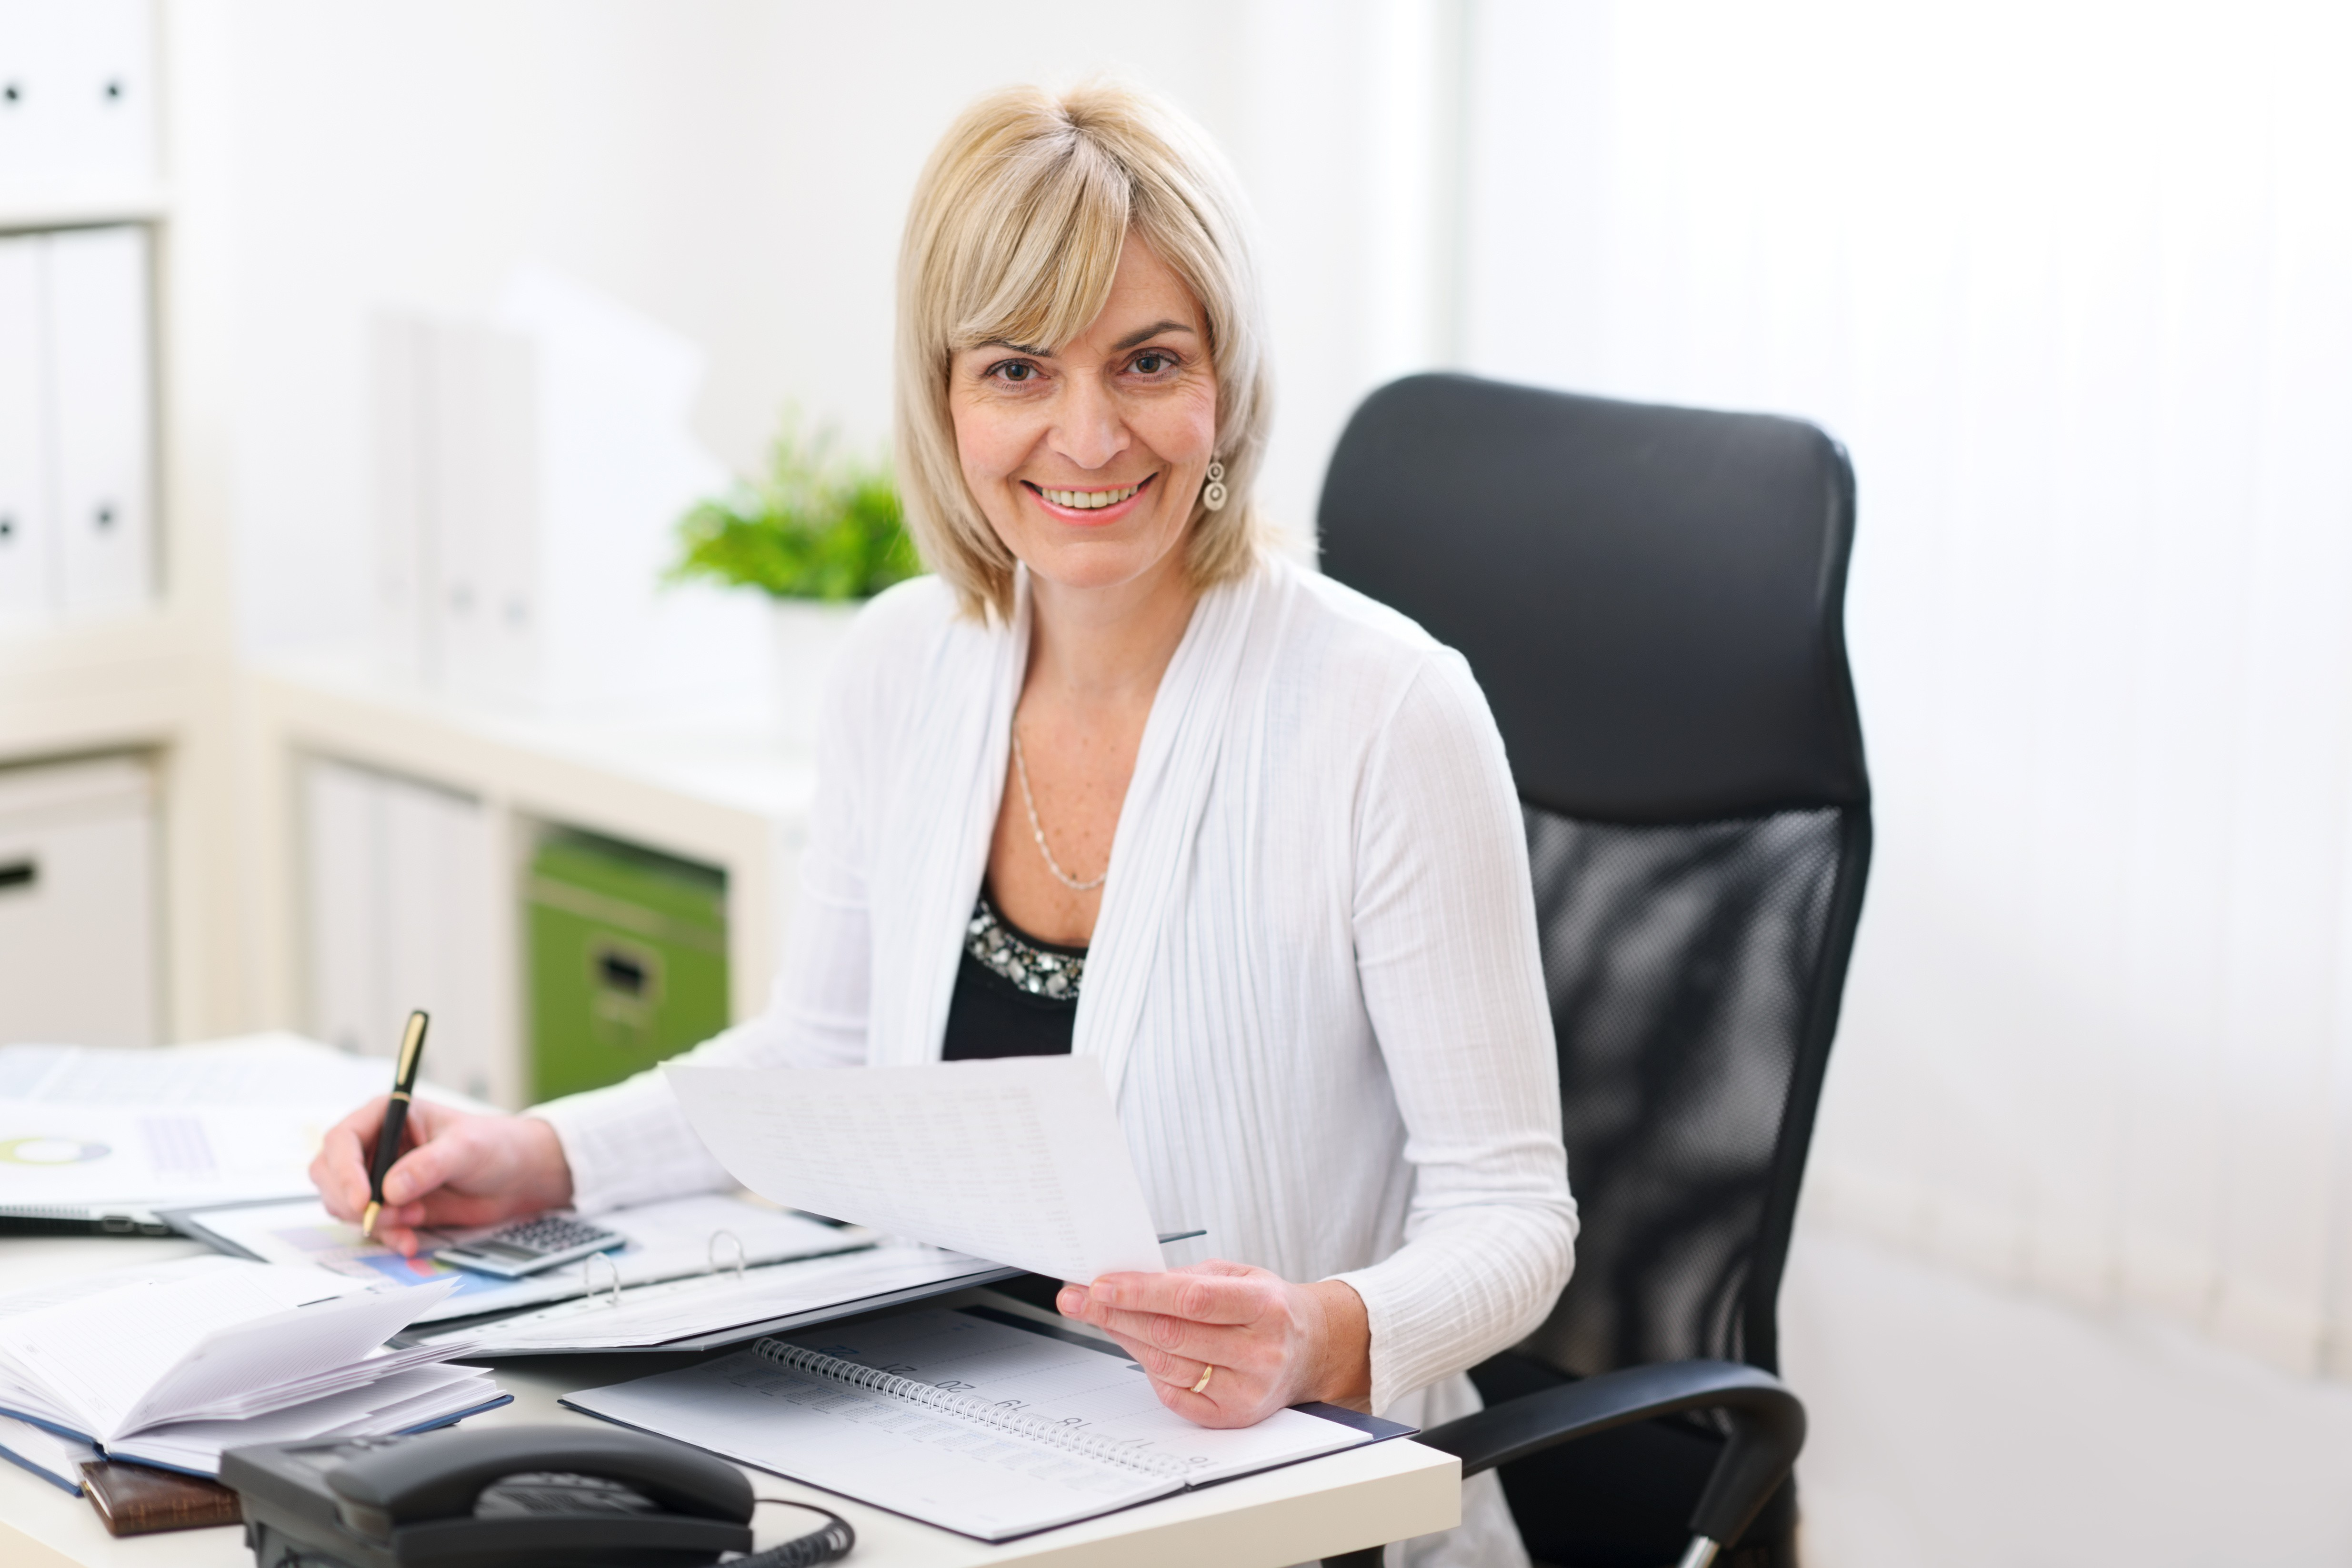 Menopausal women unable to cope at work? - Tanith Lee - Mrs Menopause